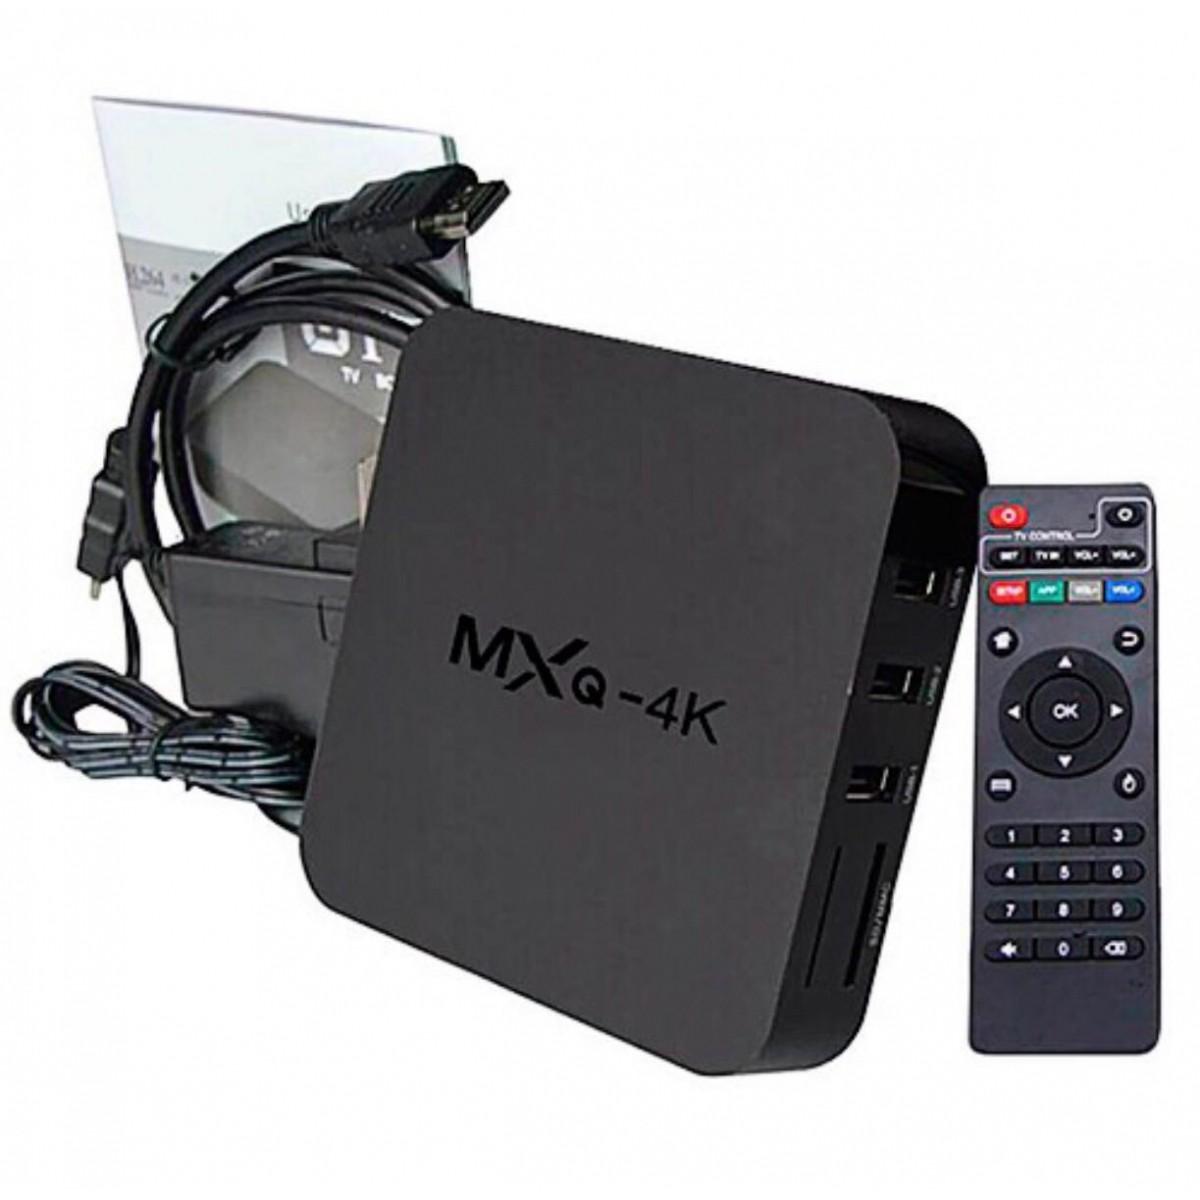 Tv Box Mxq 4k Android 6.0 Wi-fi Google Smart Tv Hdmi Netflix